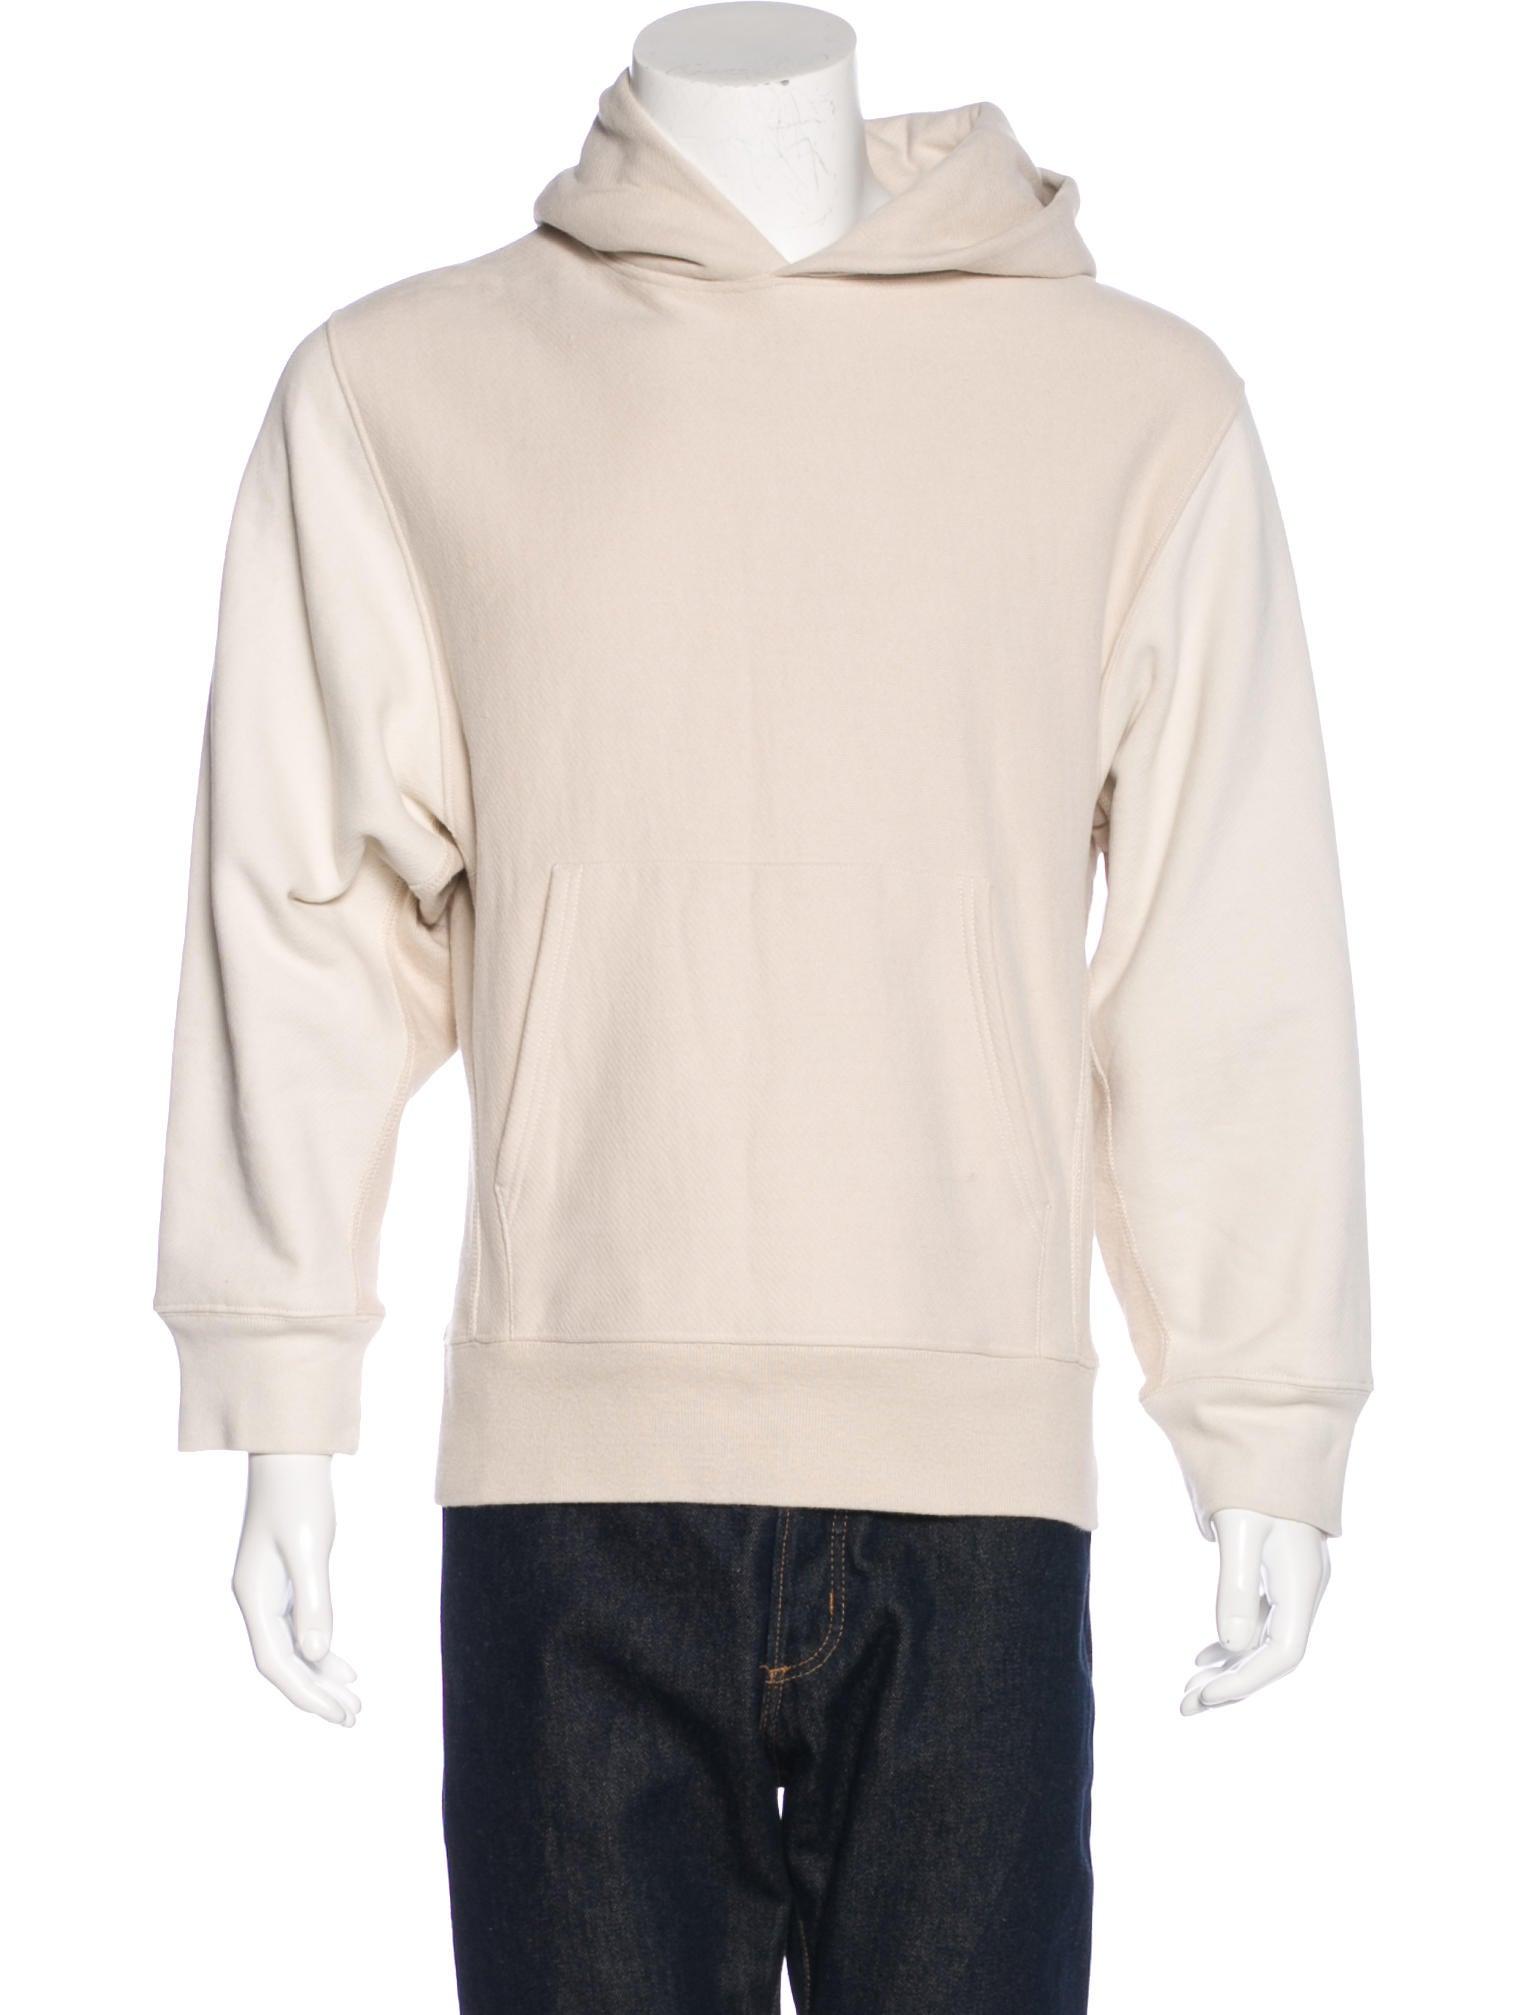 yeezy 2016 season 3 hoodie clothing wyeez20535 the. Black Bedroom Furniture Sets. Home Design Ideas